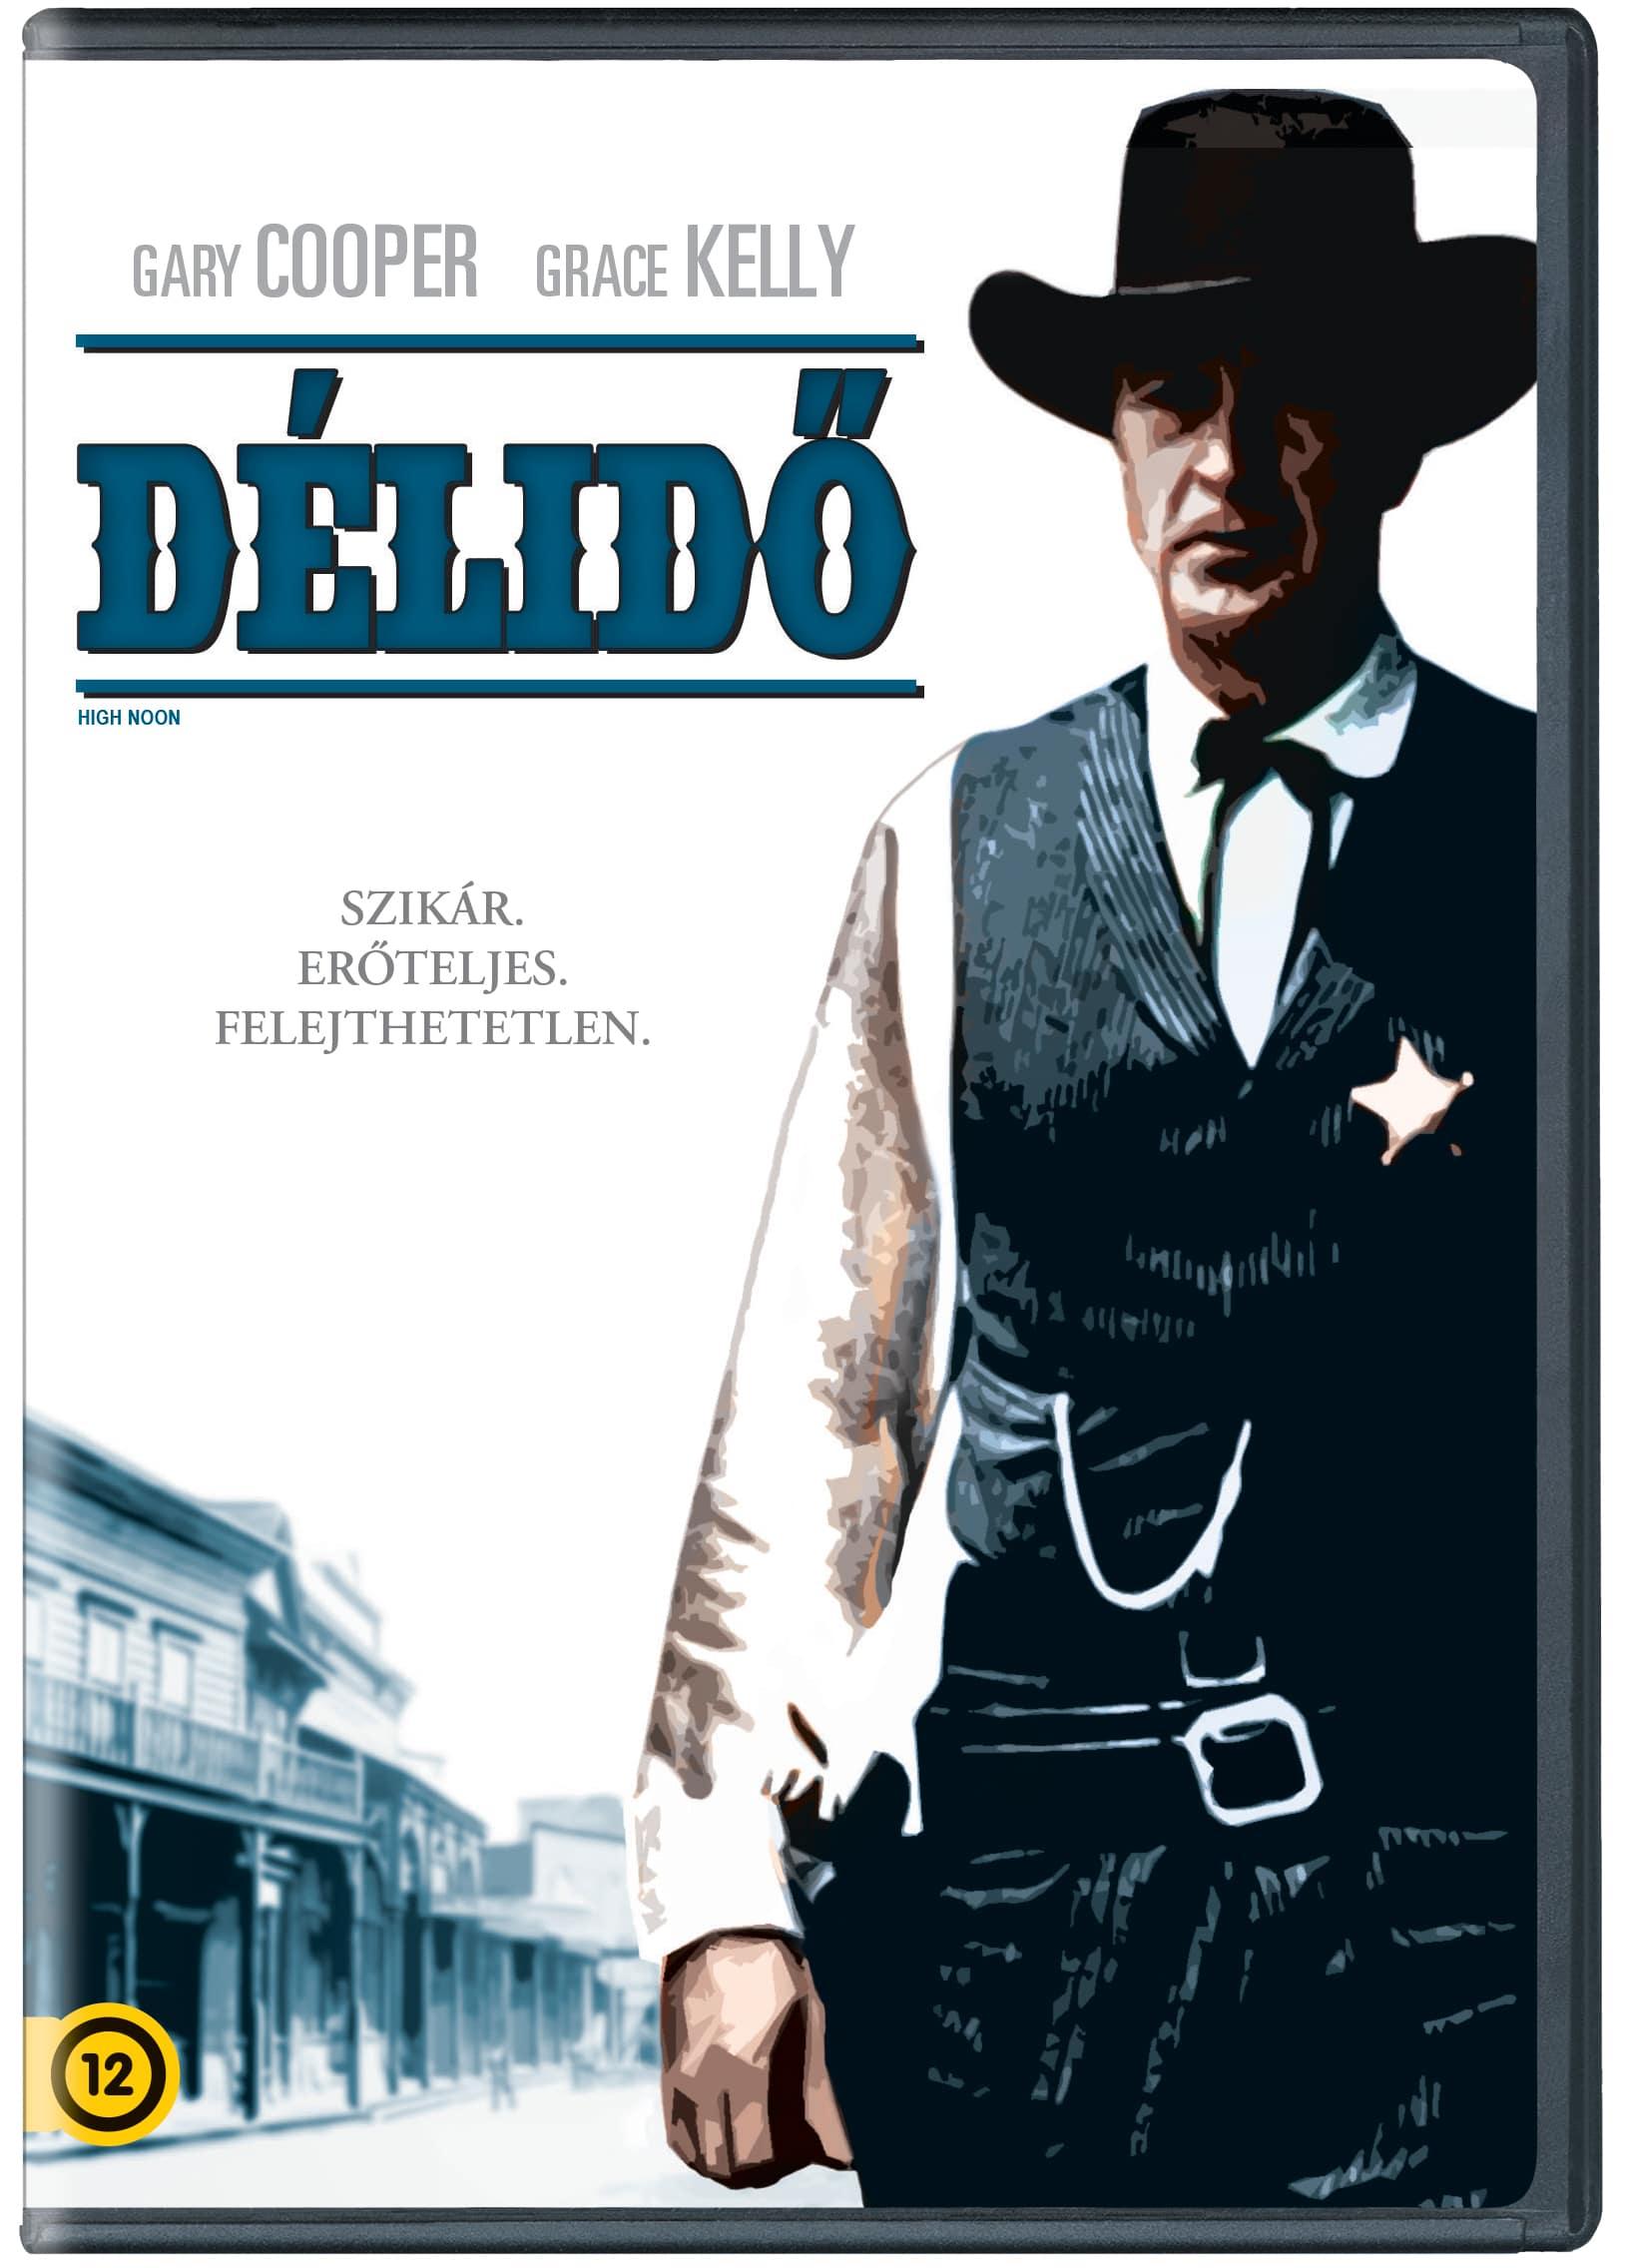 Délidő - DVD